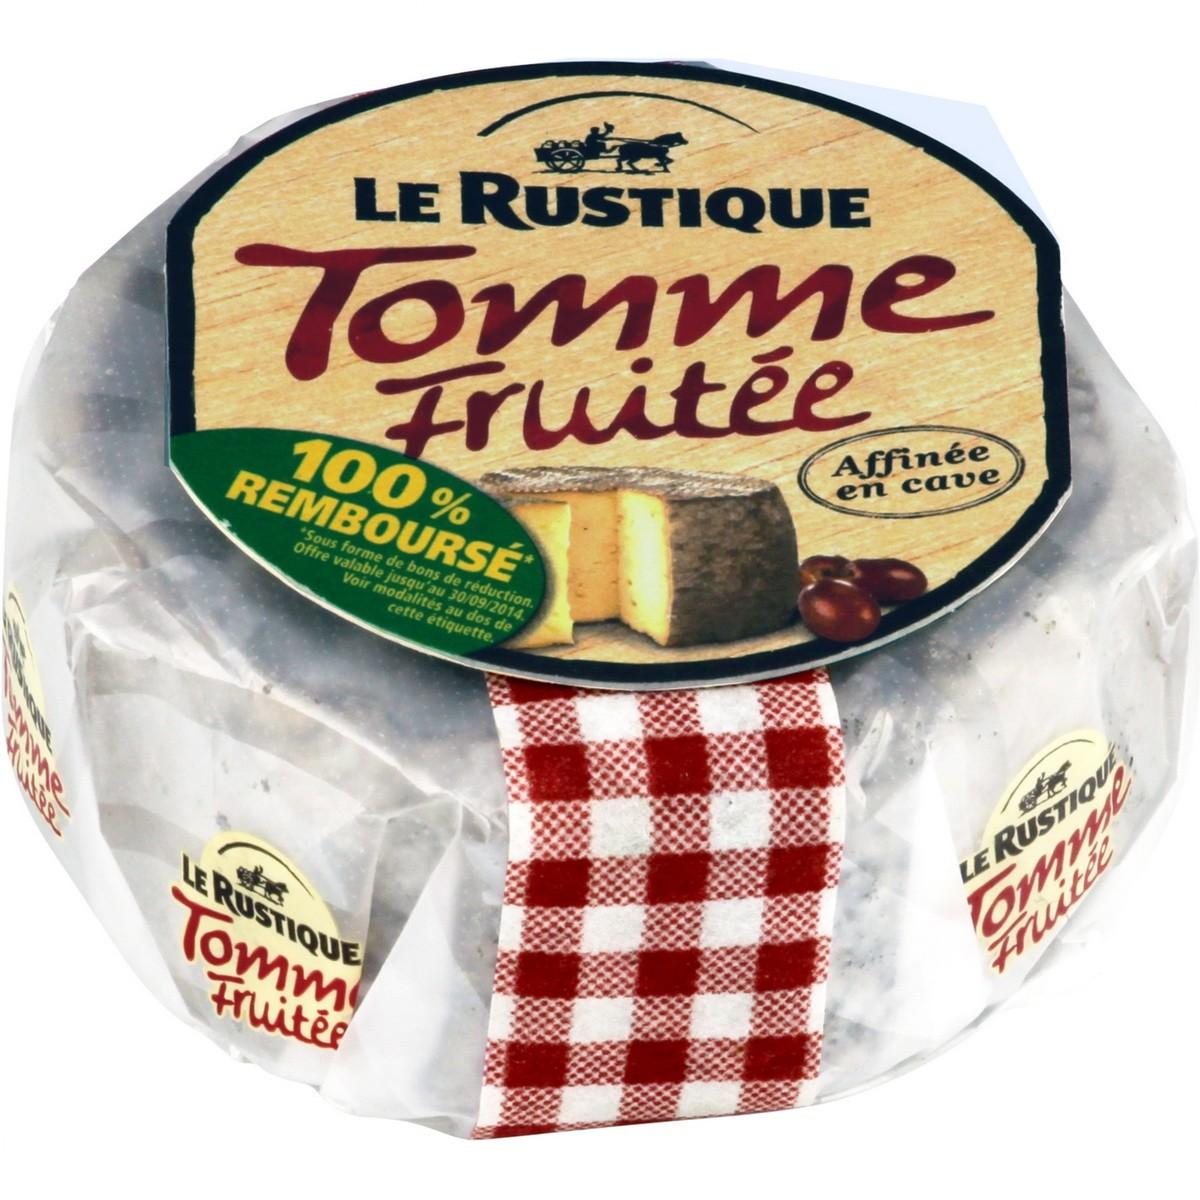 Сыр с белой плесенью Tomme Fruitte Le Rustique фото